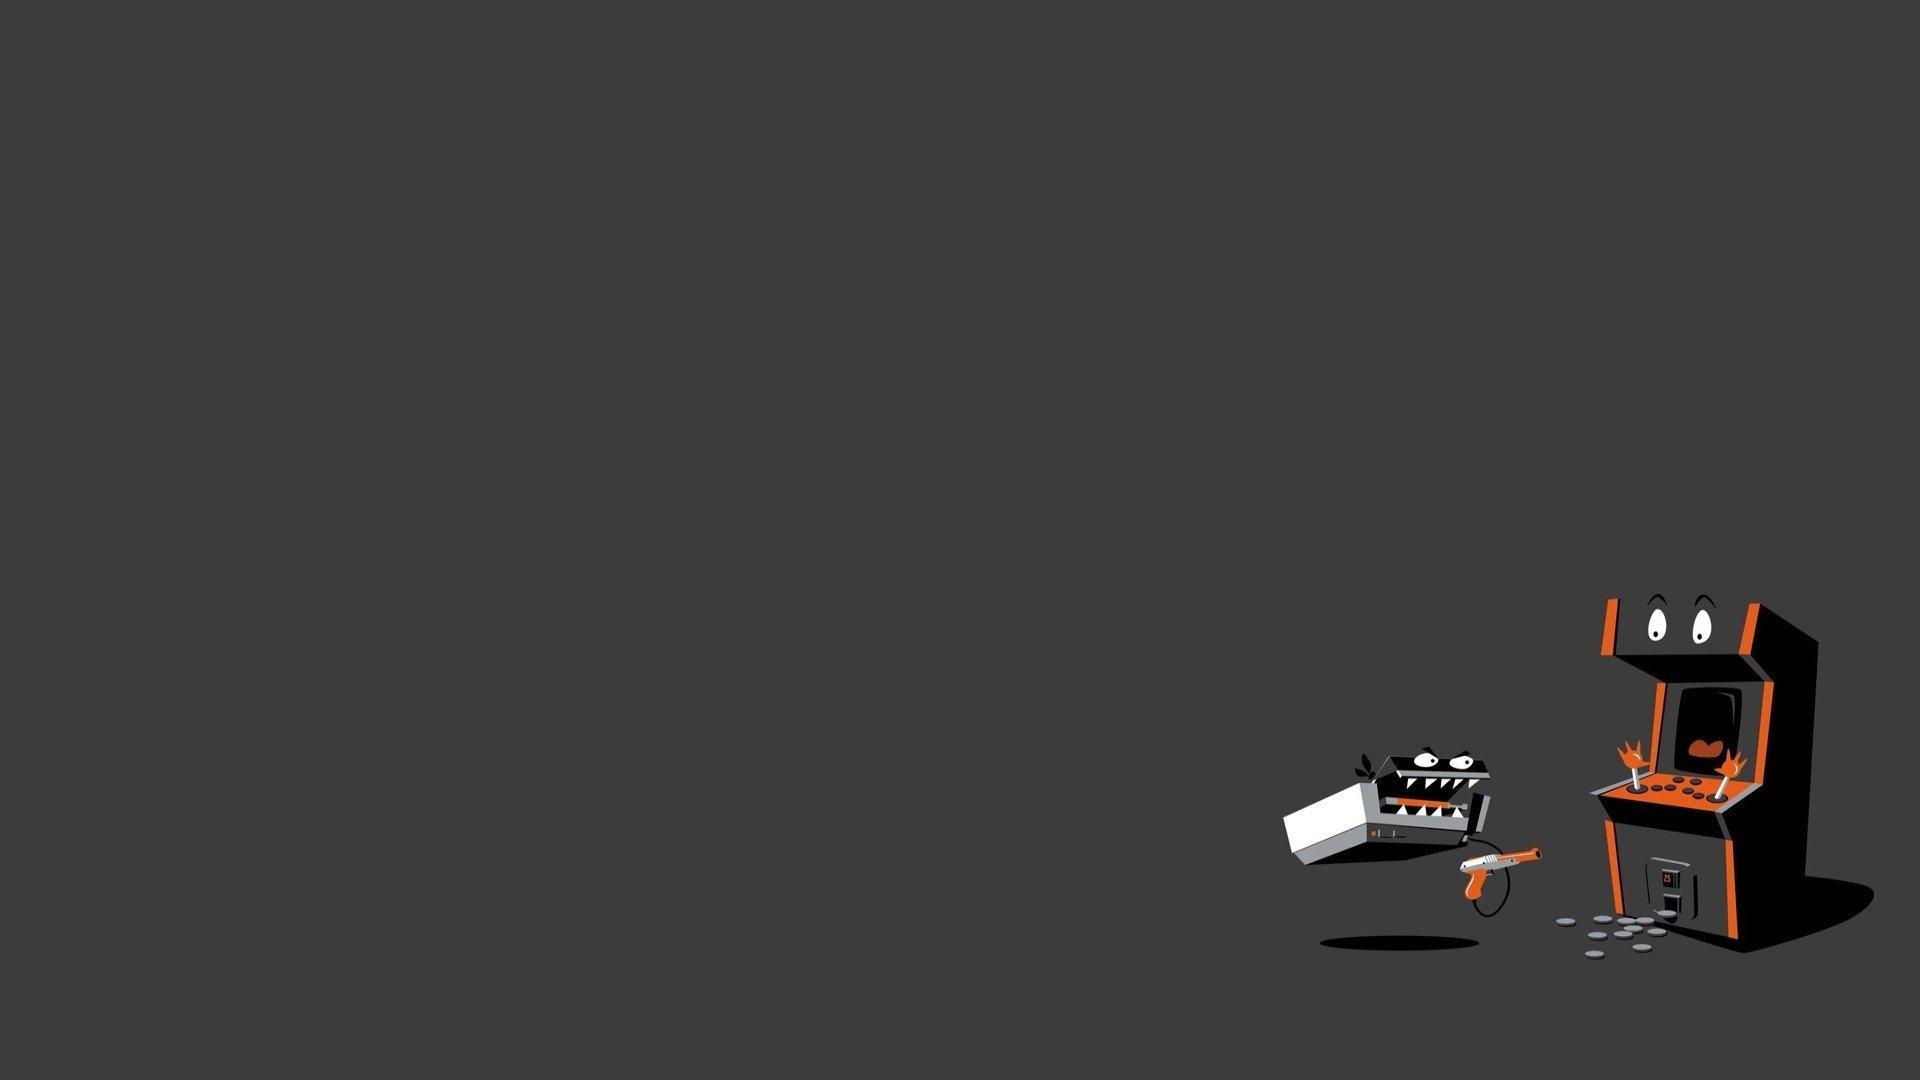 Retro Gaming desktop wallpaper